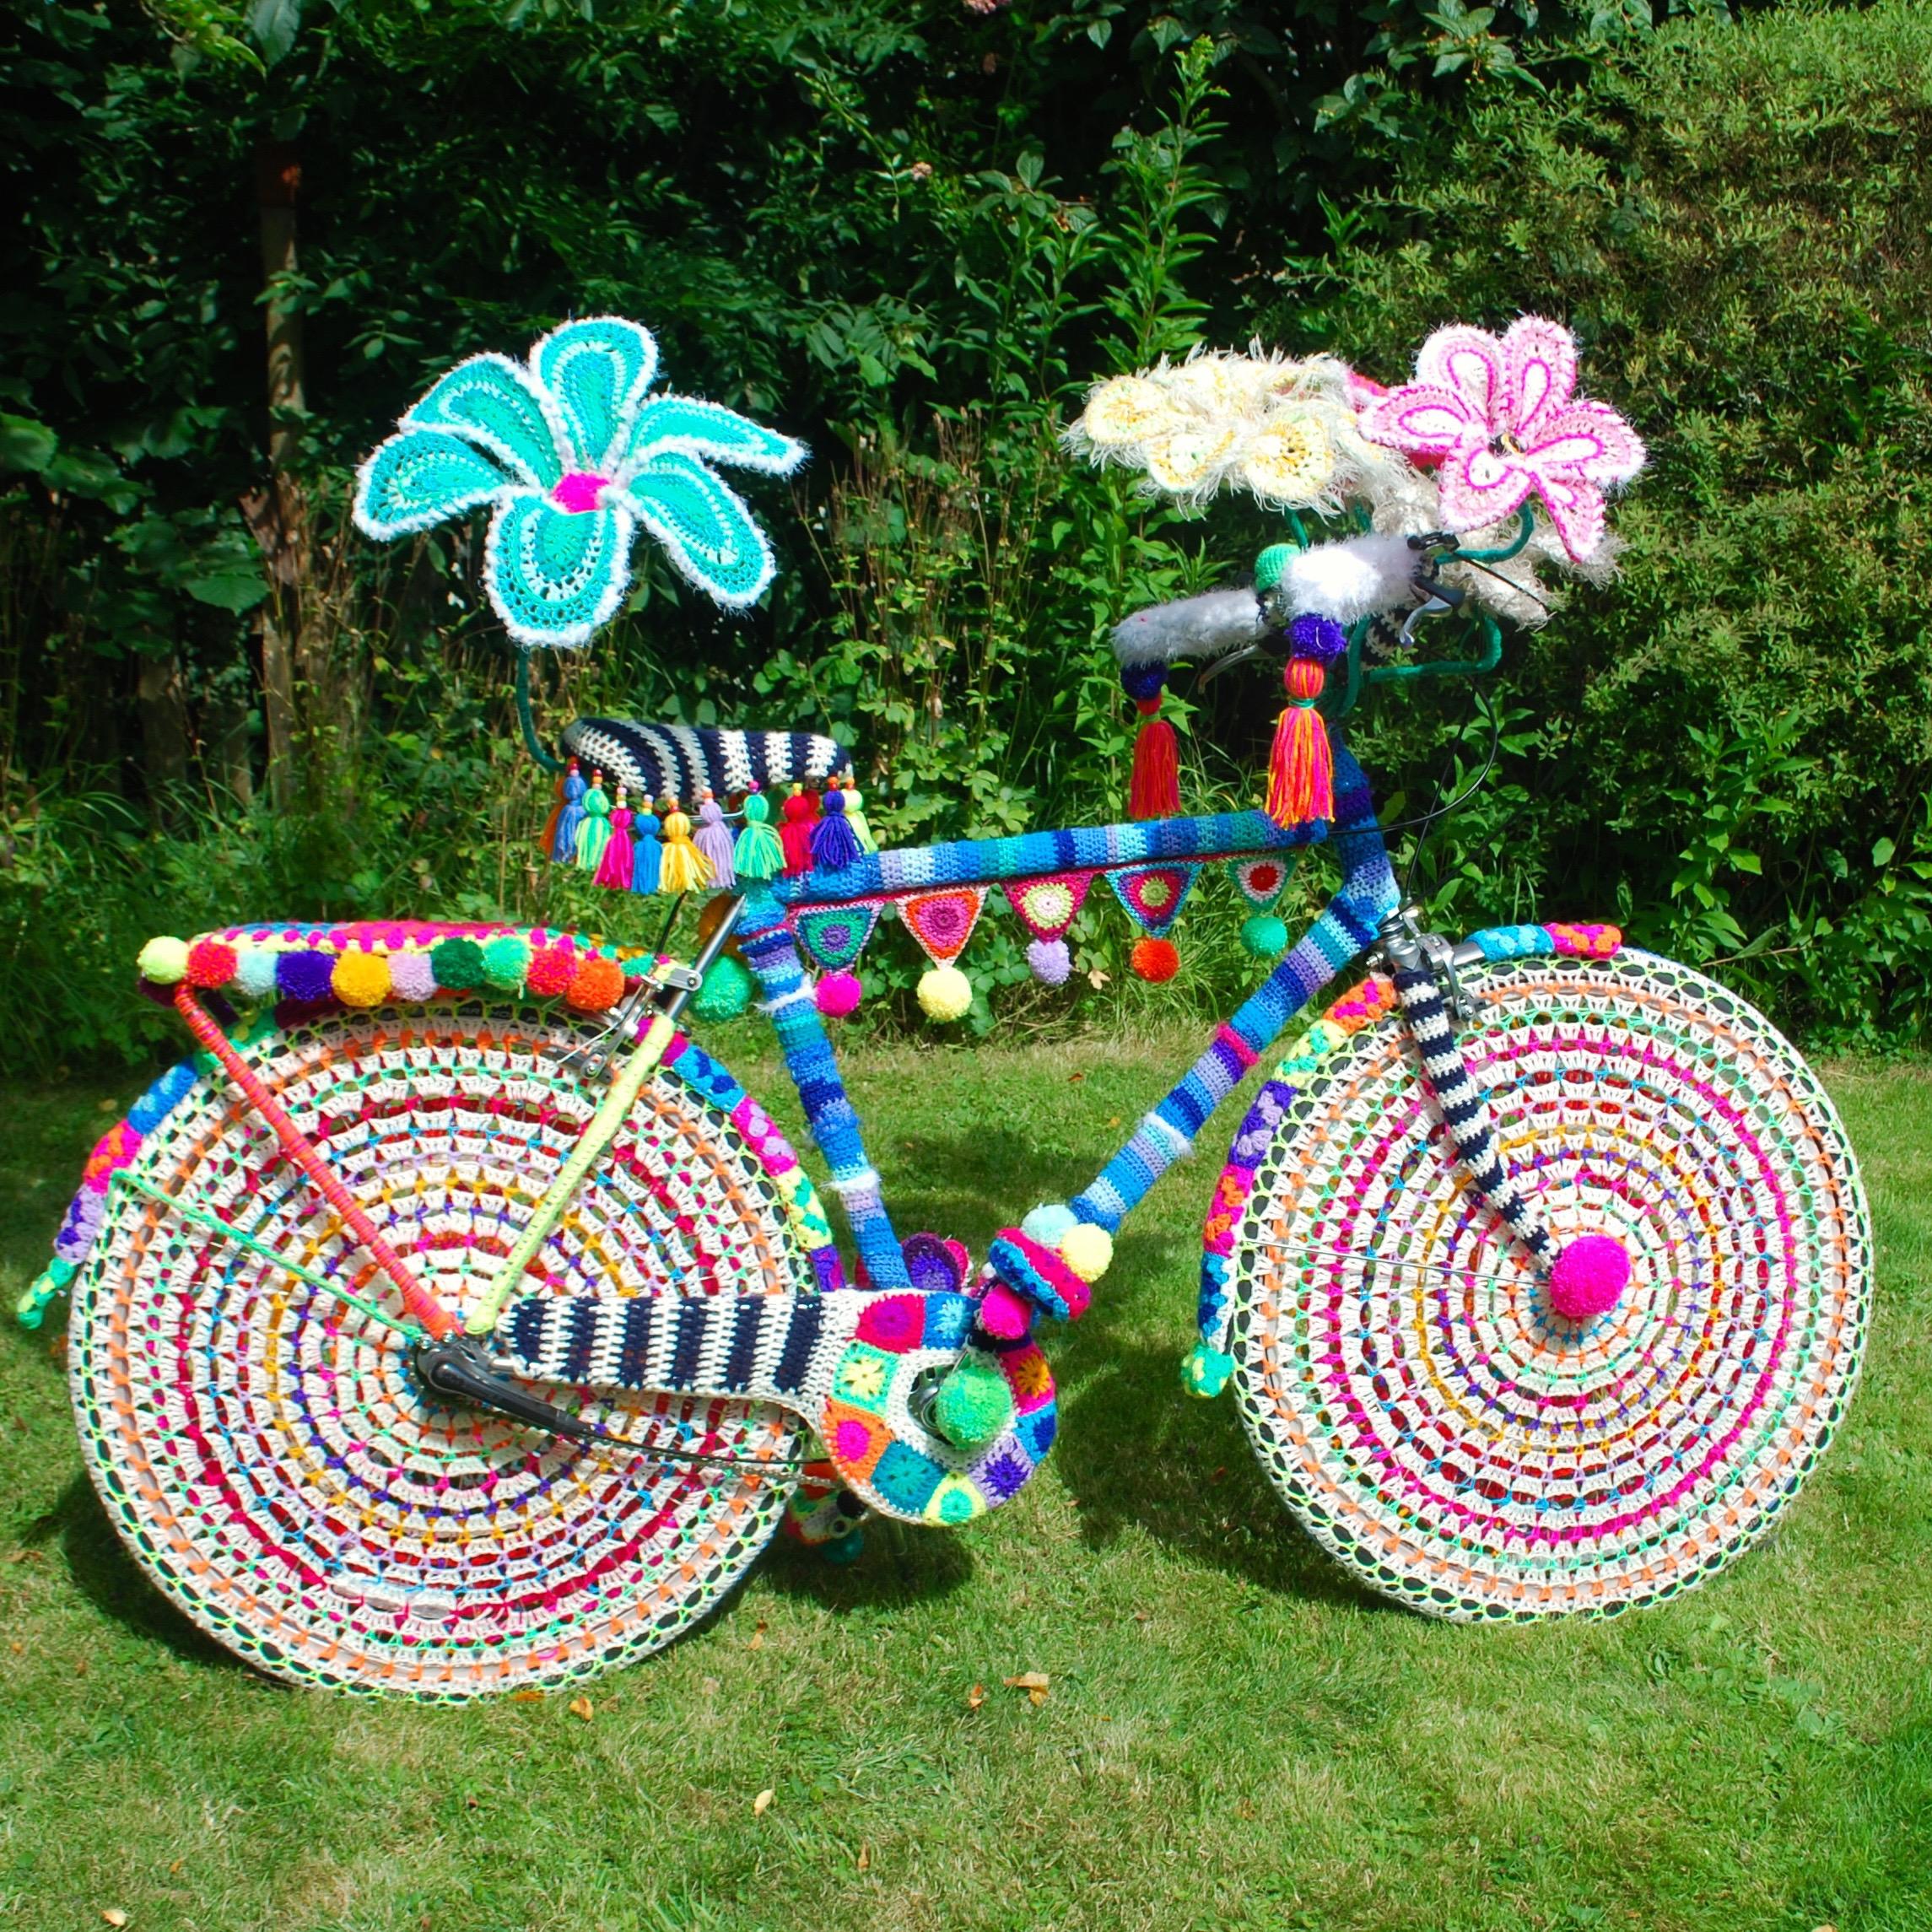 Rio Carnival in wool - yarn bomb bike by Emma Leith